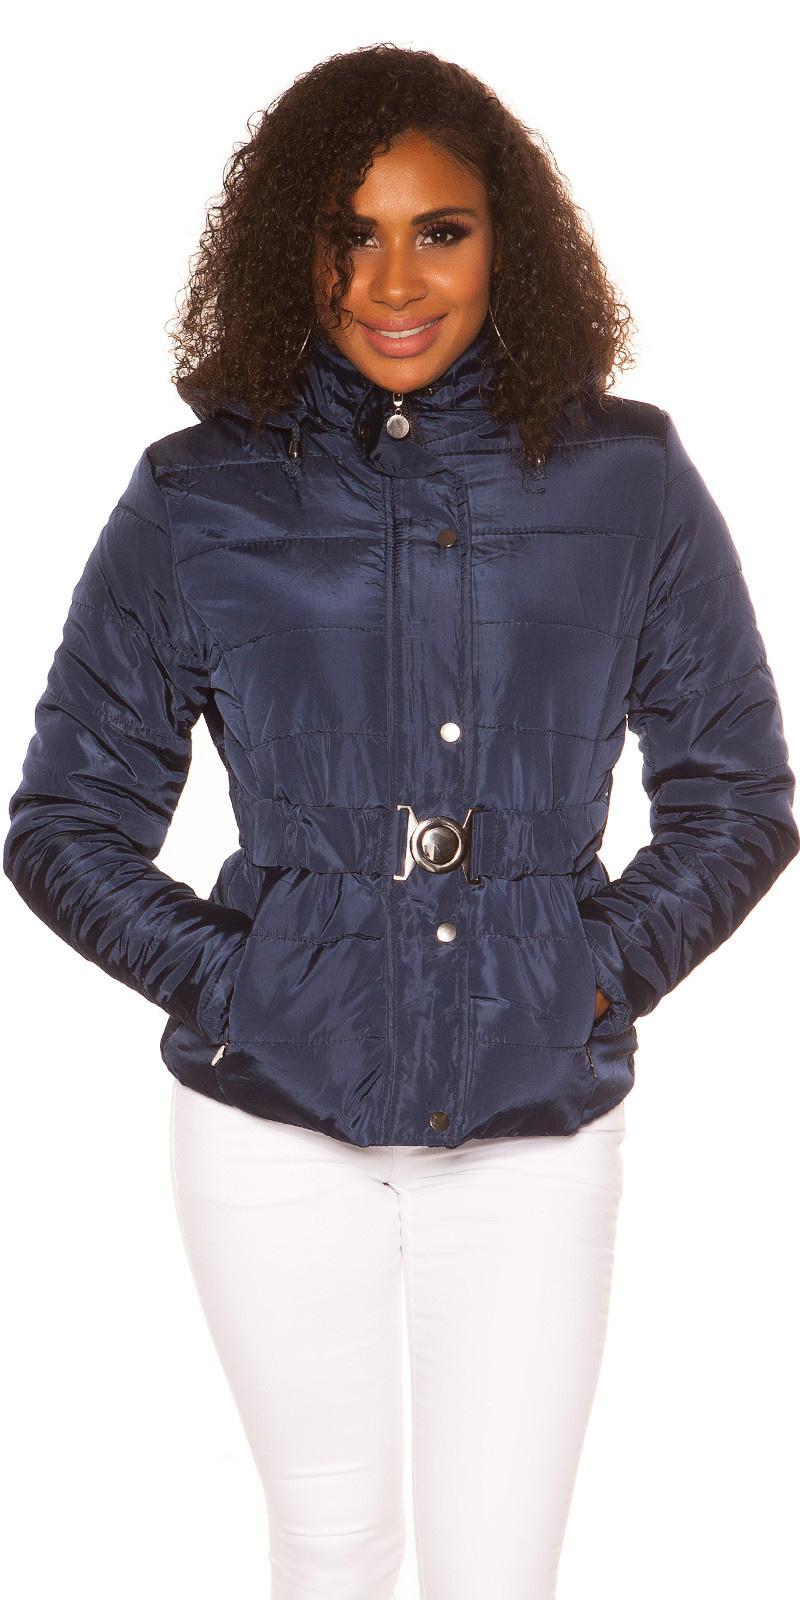 Trendy winterjas met riem marine blauw